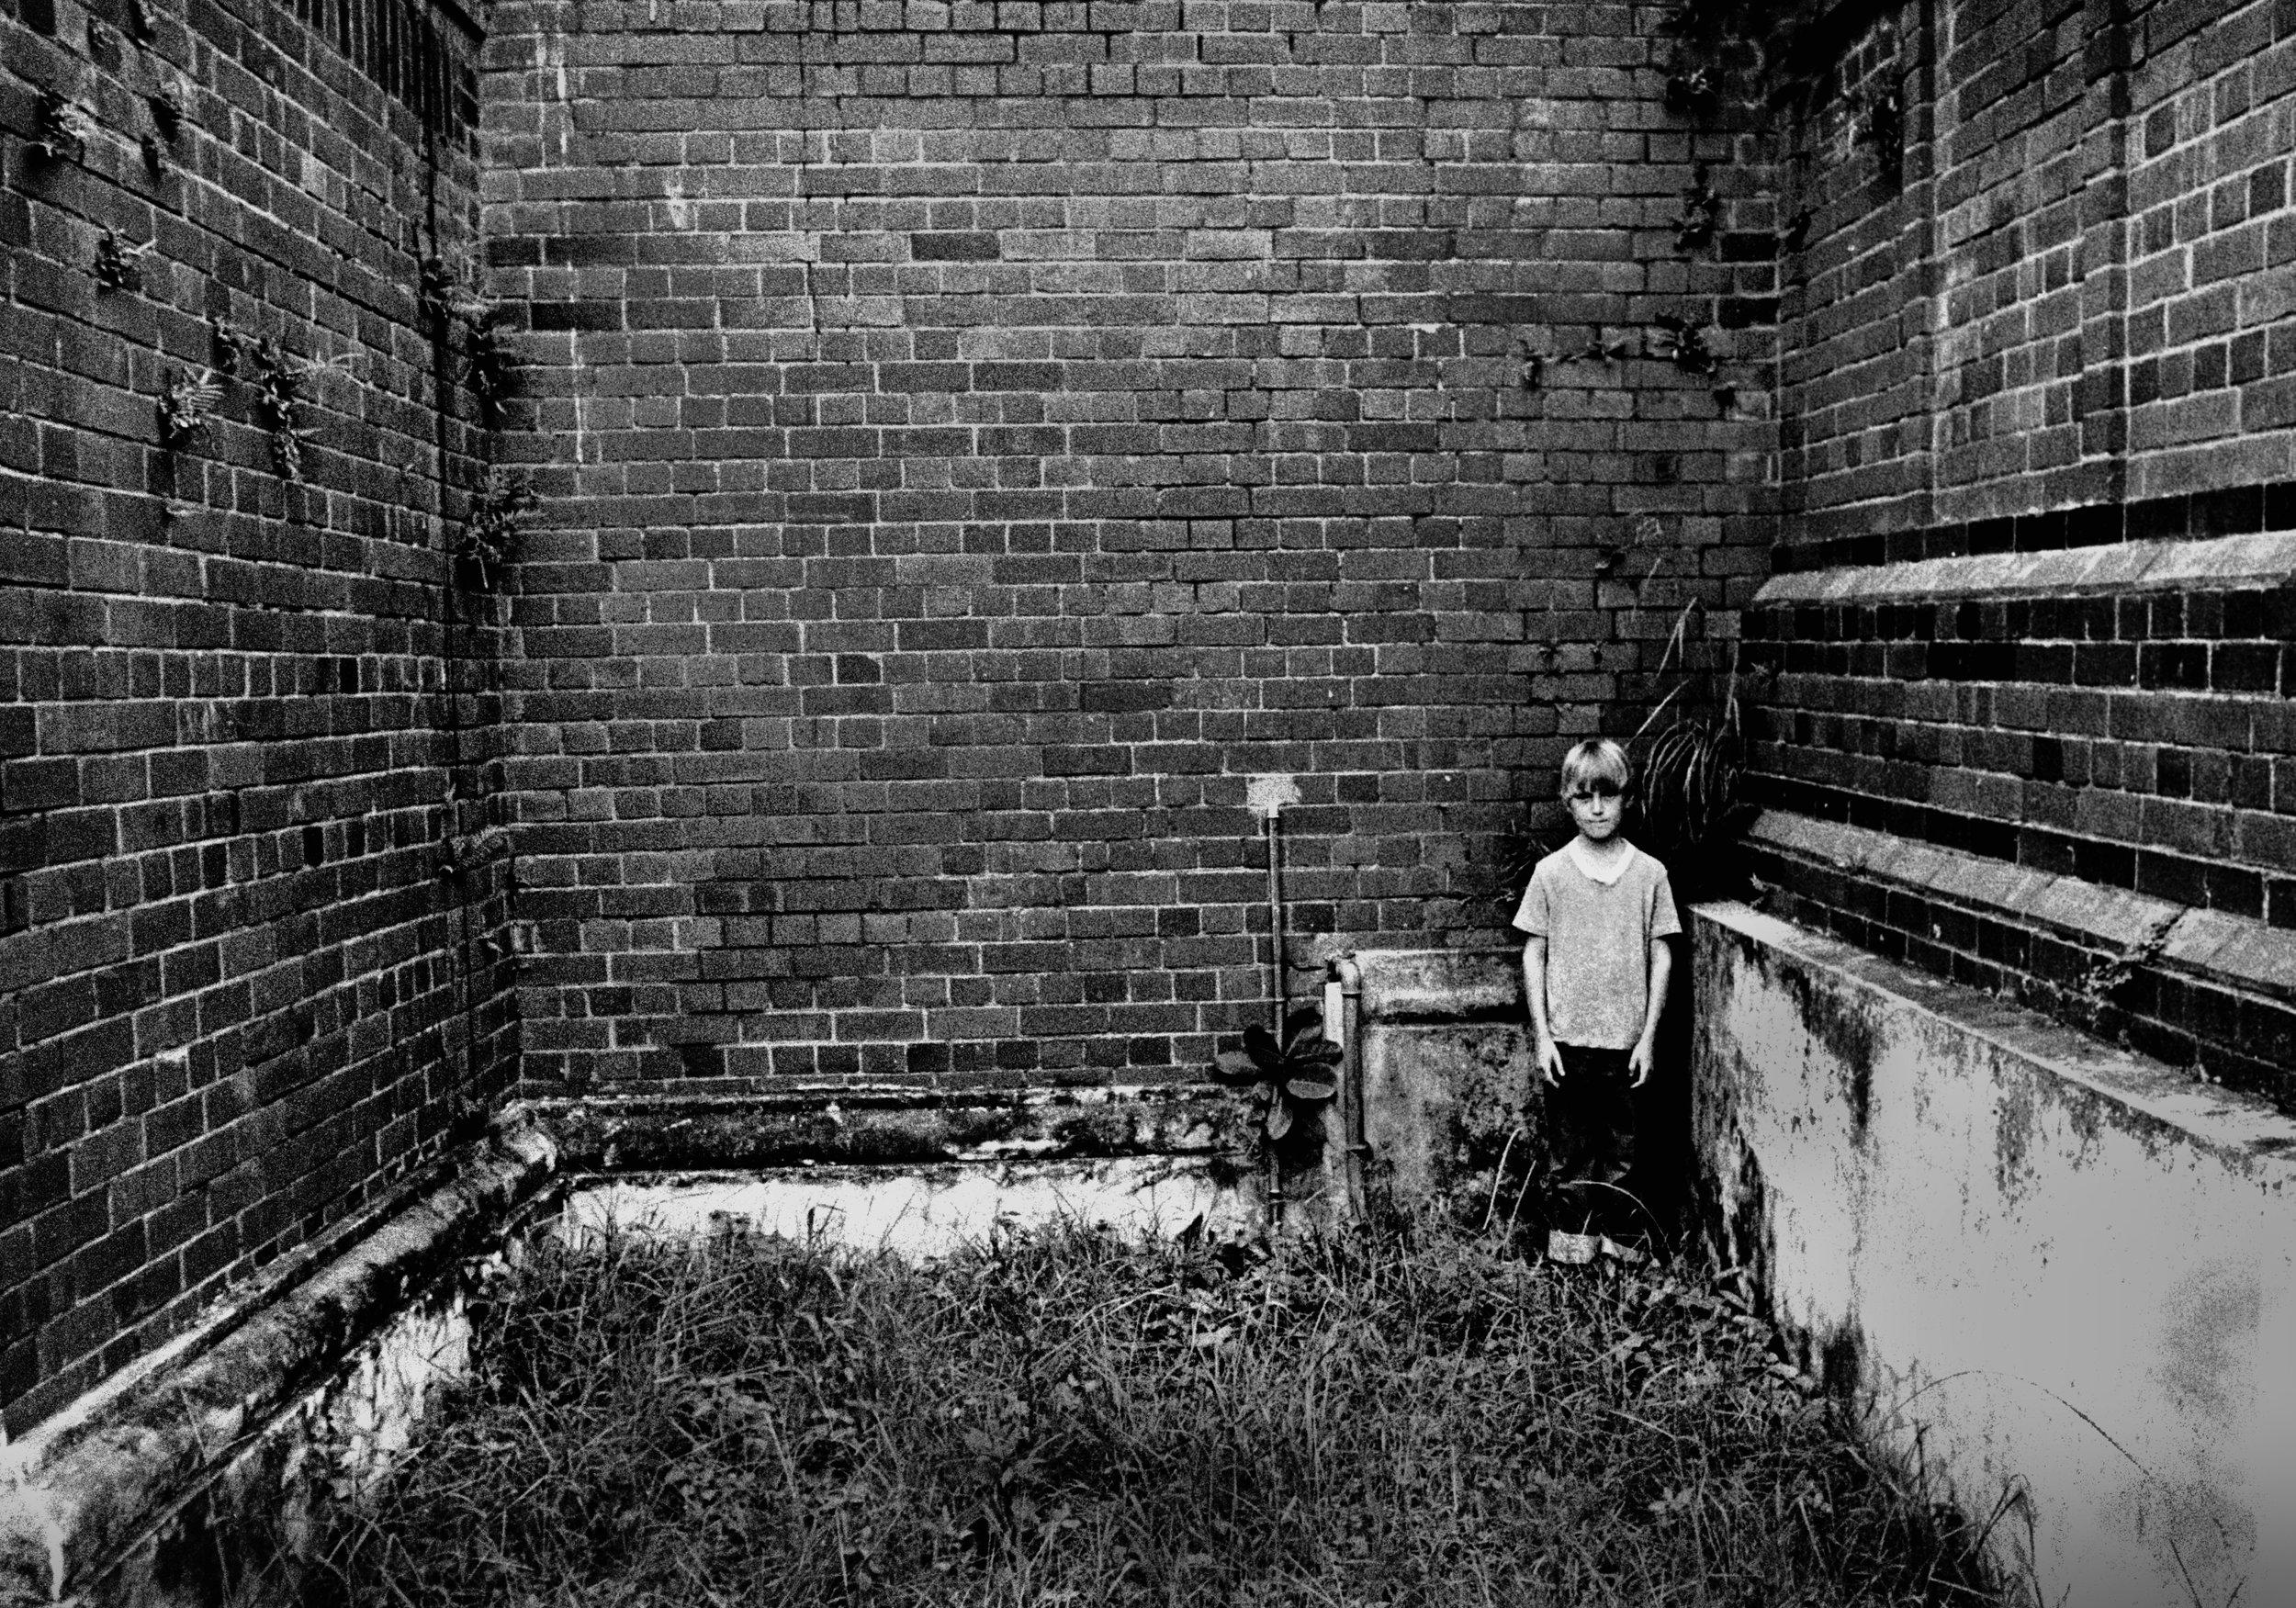 Boy hiding, Durban, South Africa, 1977